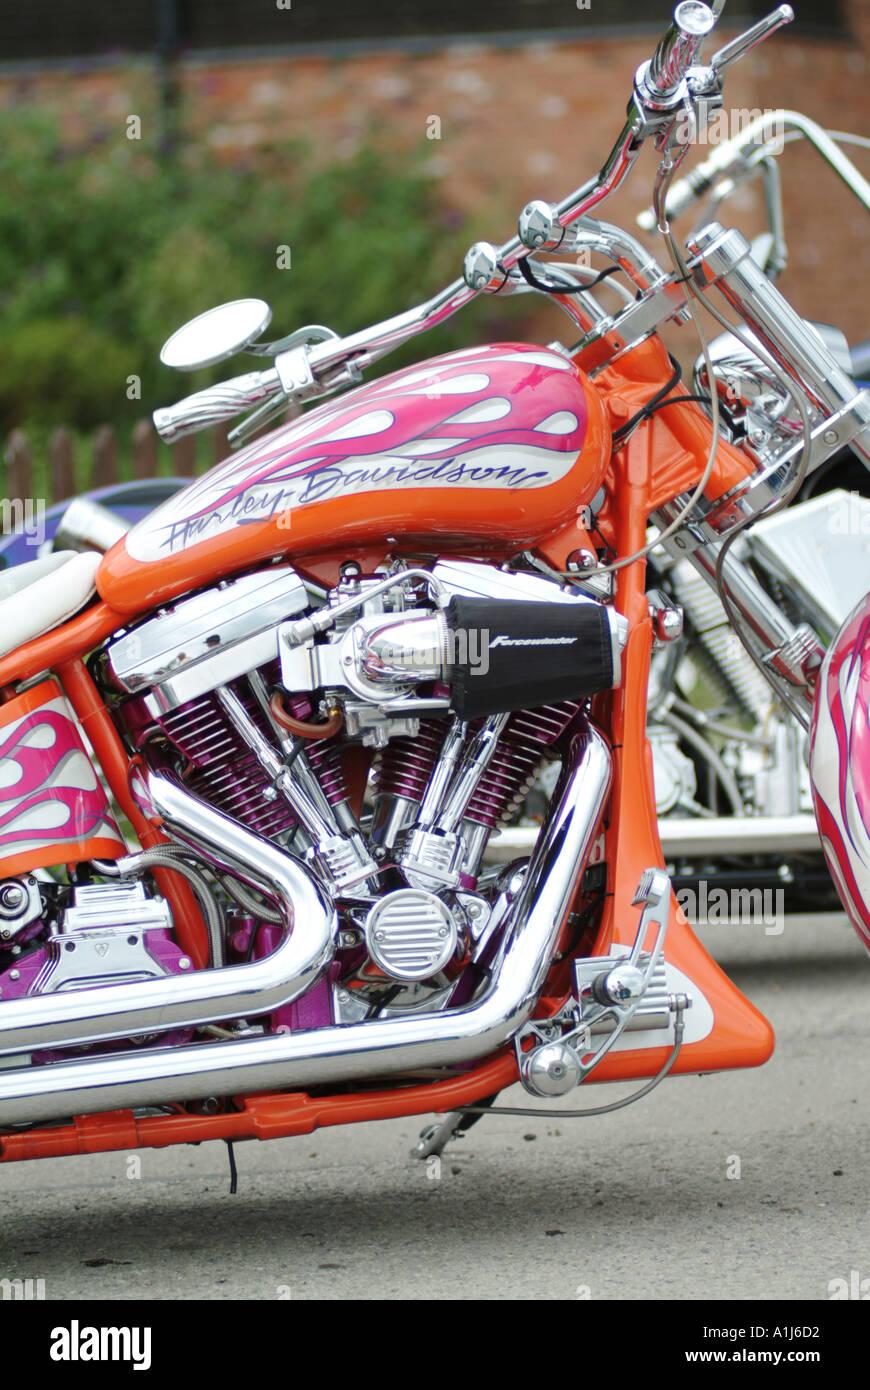 harley davidson custom motor cycle bike v twin american america chopper customised modified - Stock Image